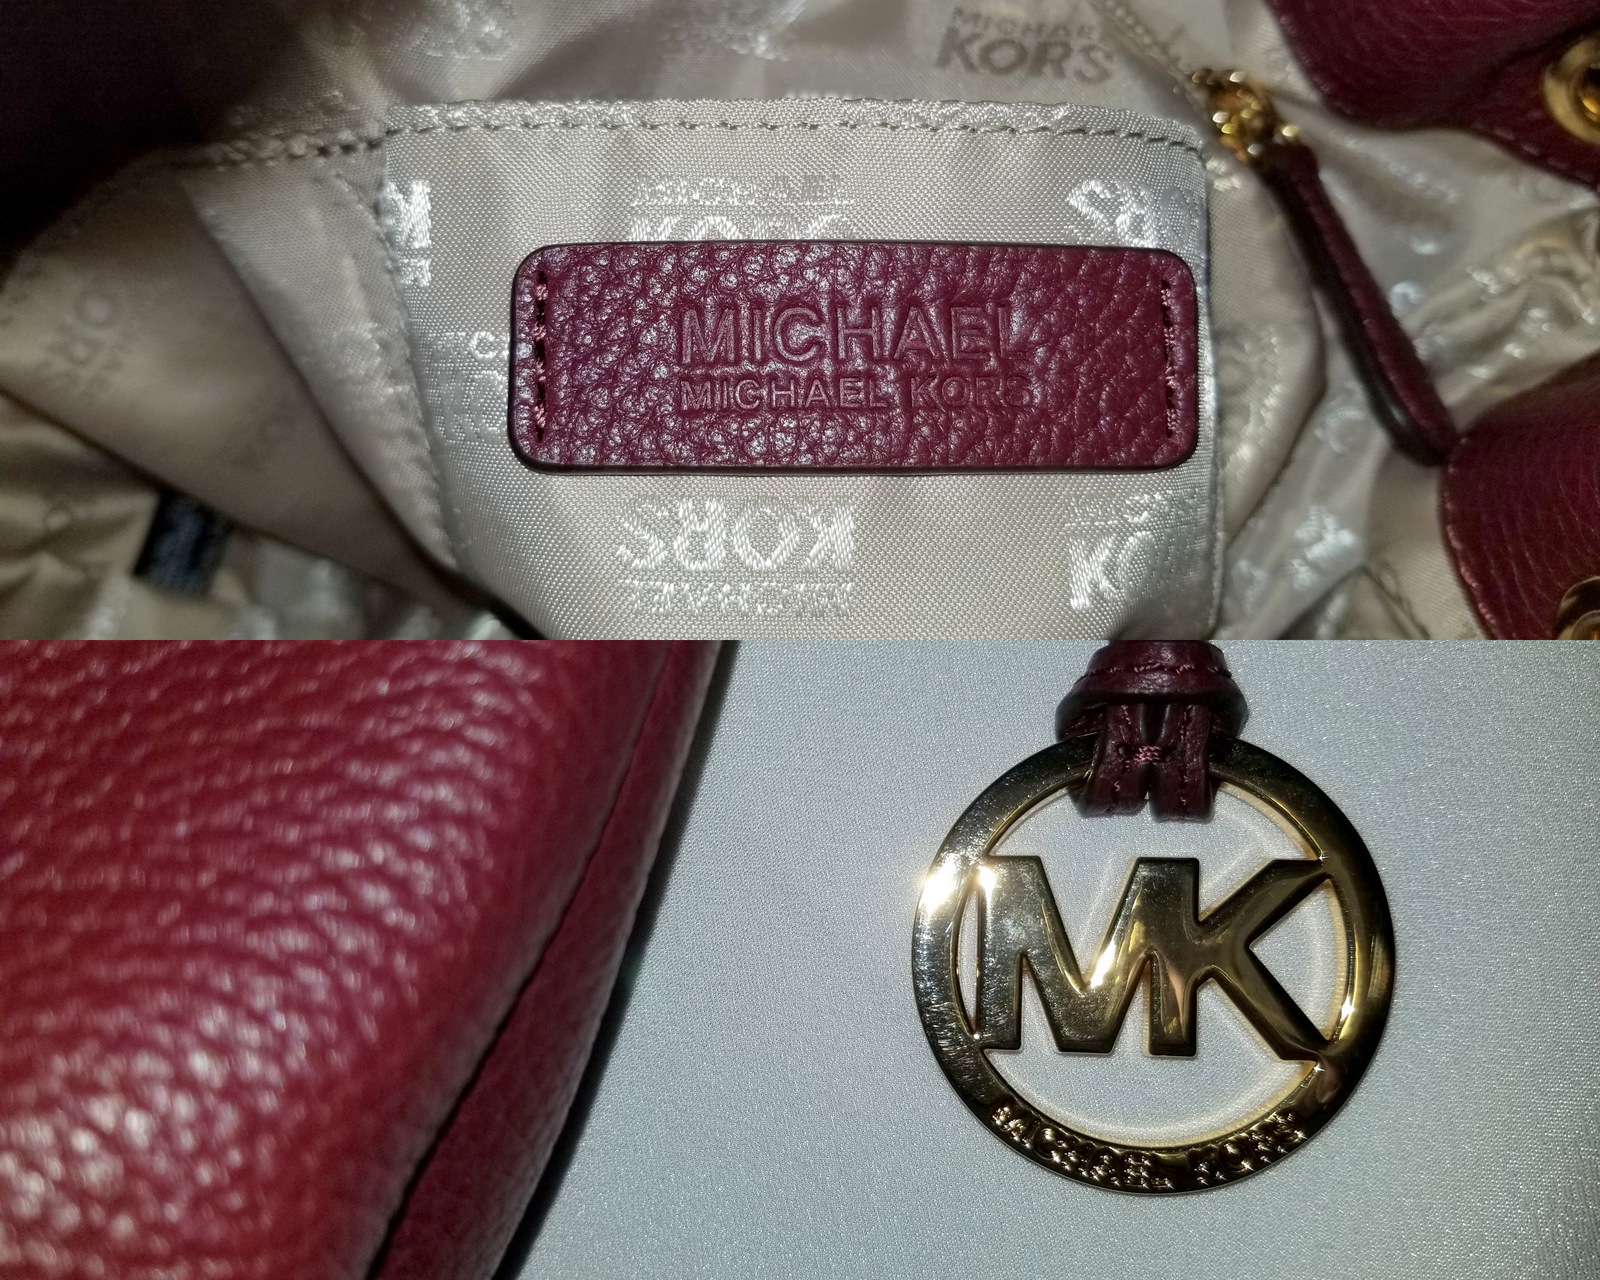 Michael Kors Bucket Shoulder Frankie Oxblood Burgundy Leather Cross Body Bag image 7